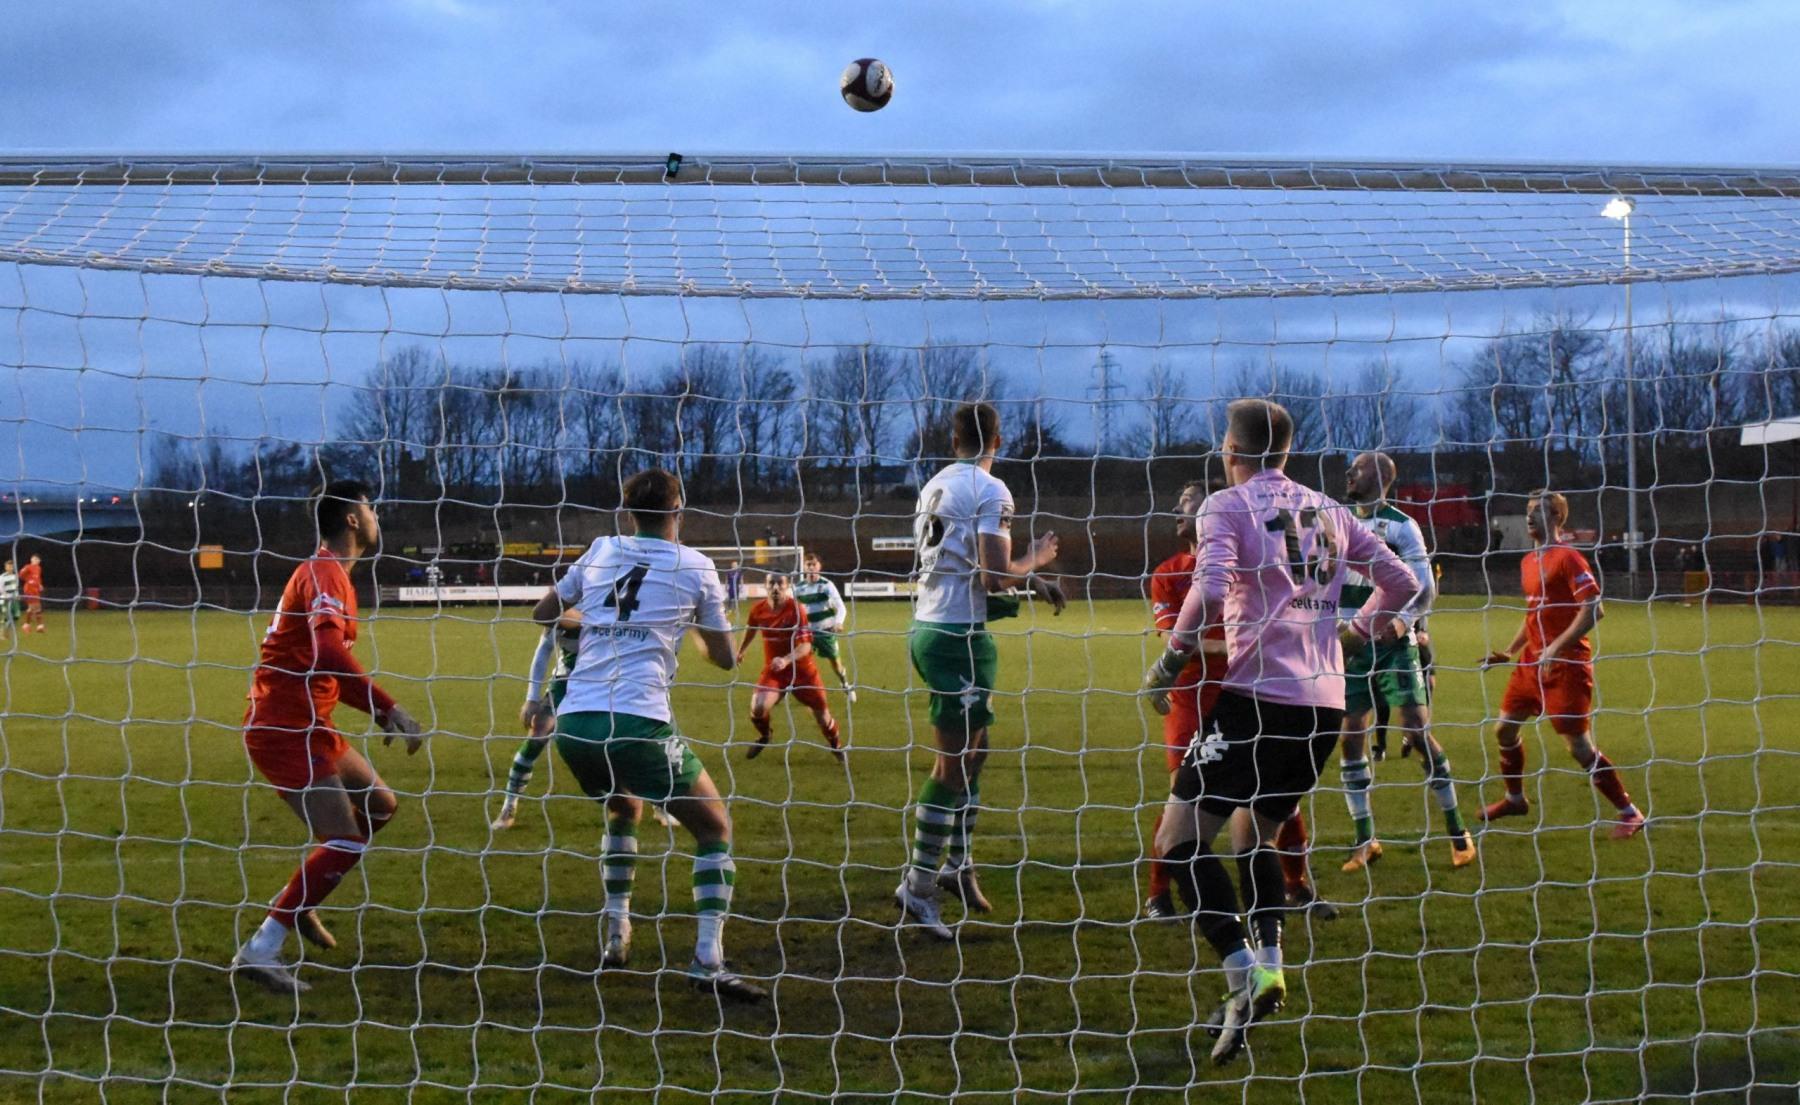 Workington-Reds-v-Farsley-Celtic-Ben-Challis-17-scaled